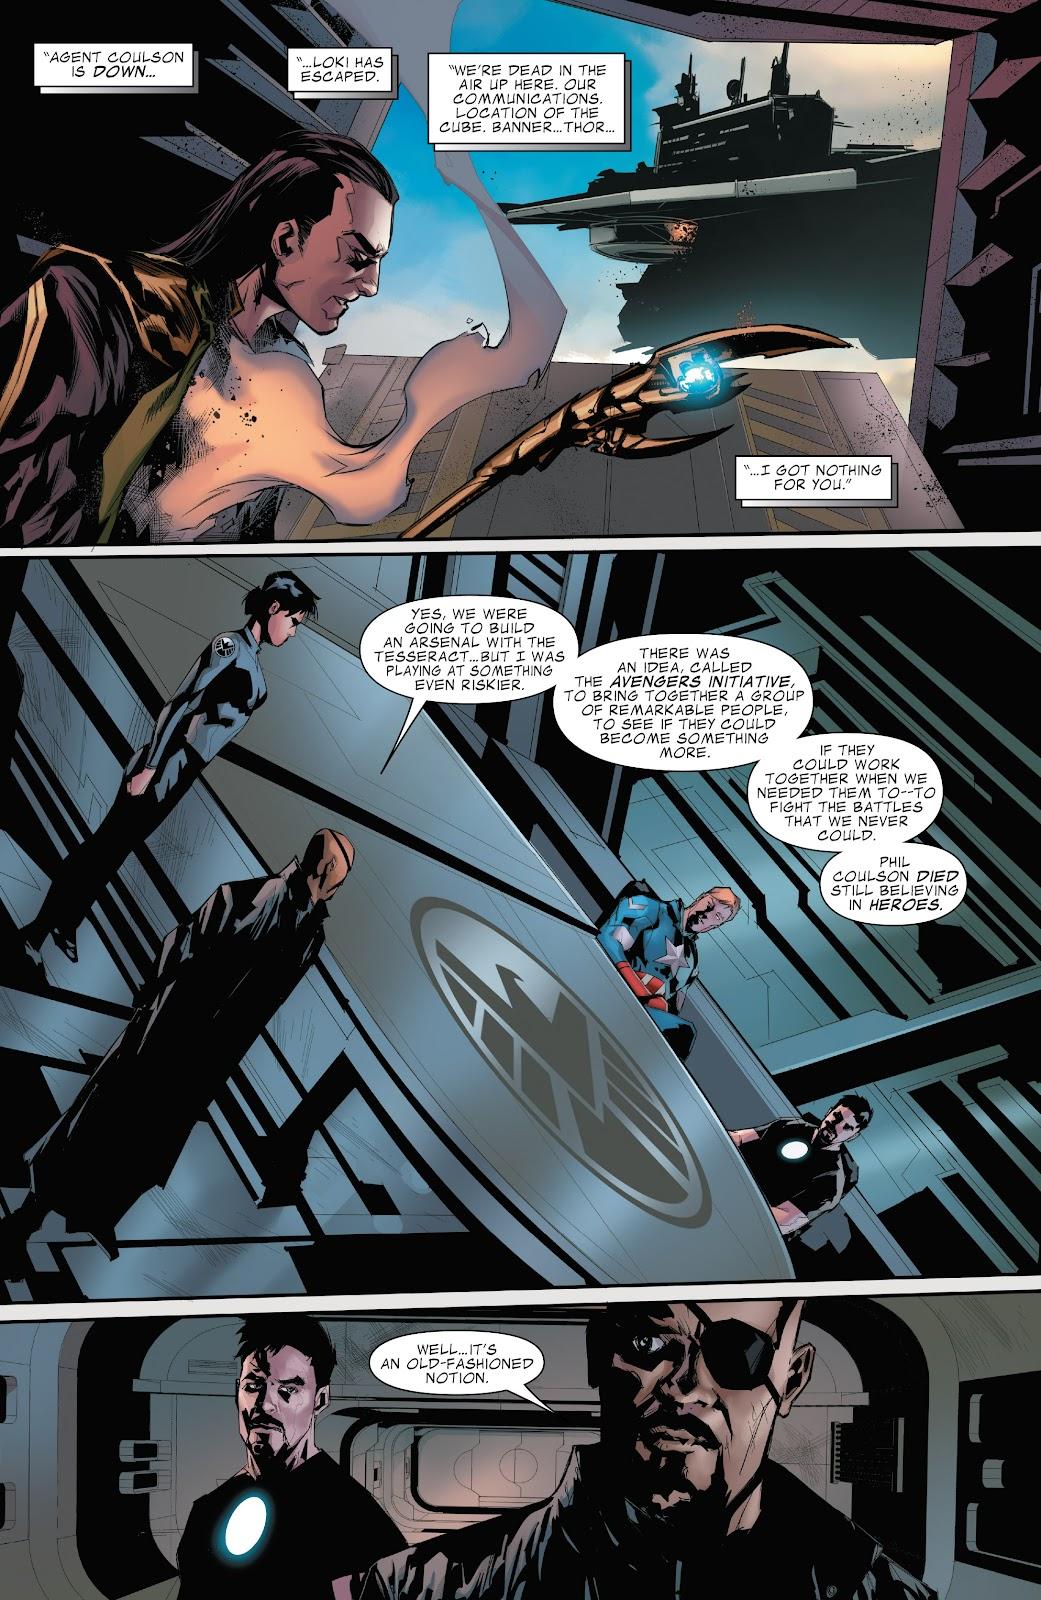 Read online Marvel's The Avengers comic -  Issue #2 - 6